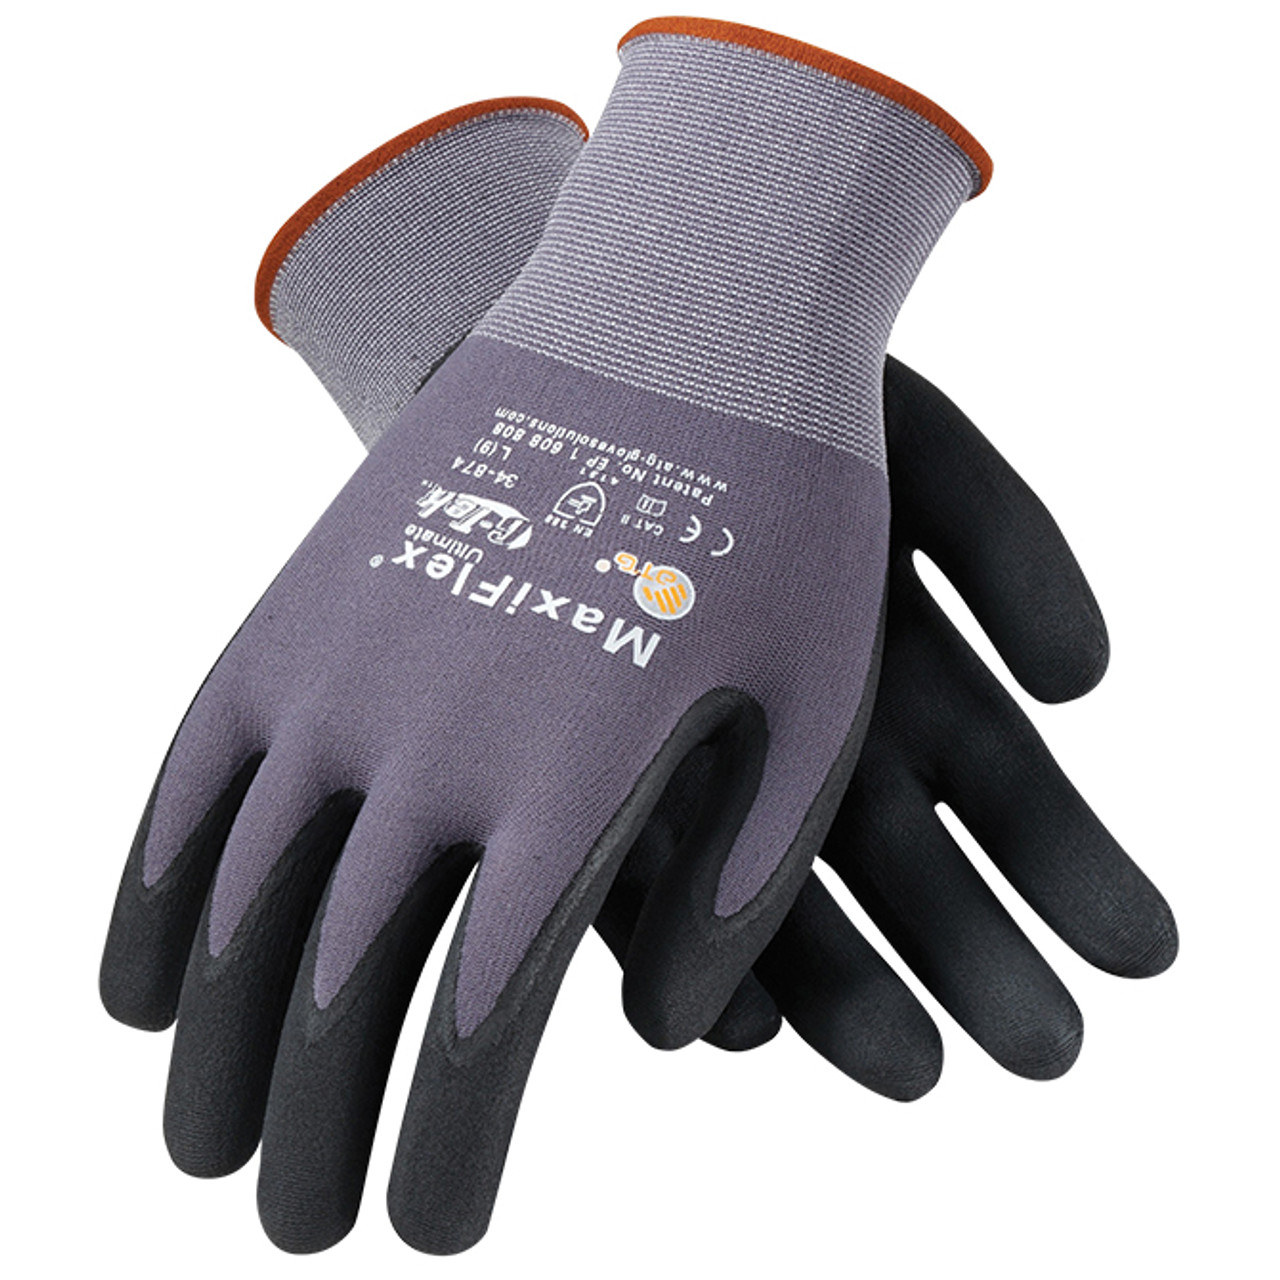 Reusable Gloves